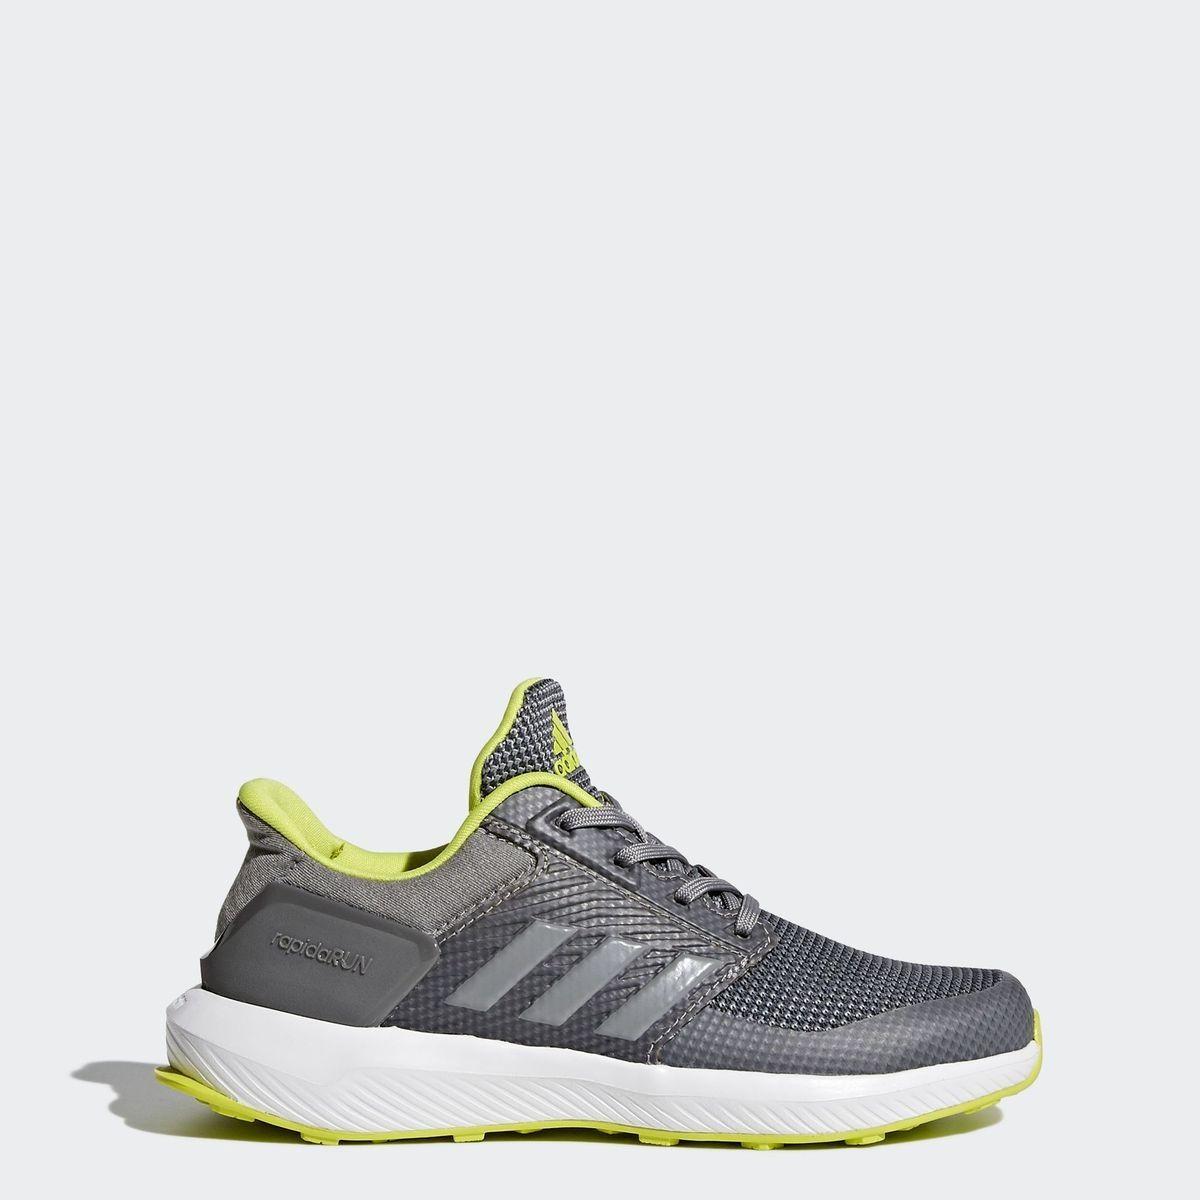 chaussure nike enfant garçon 31